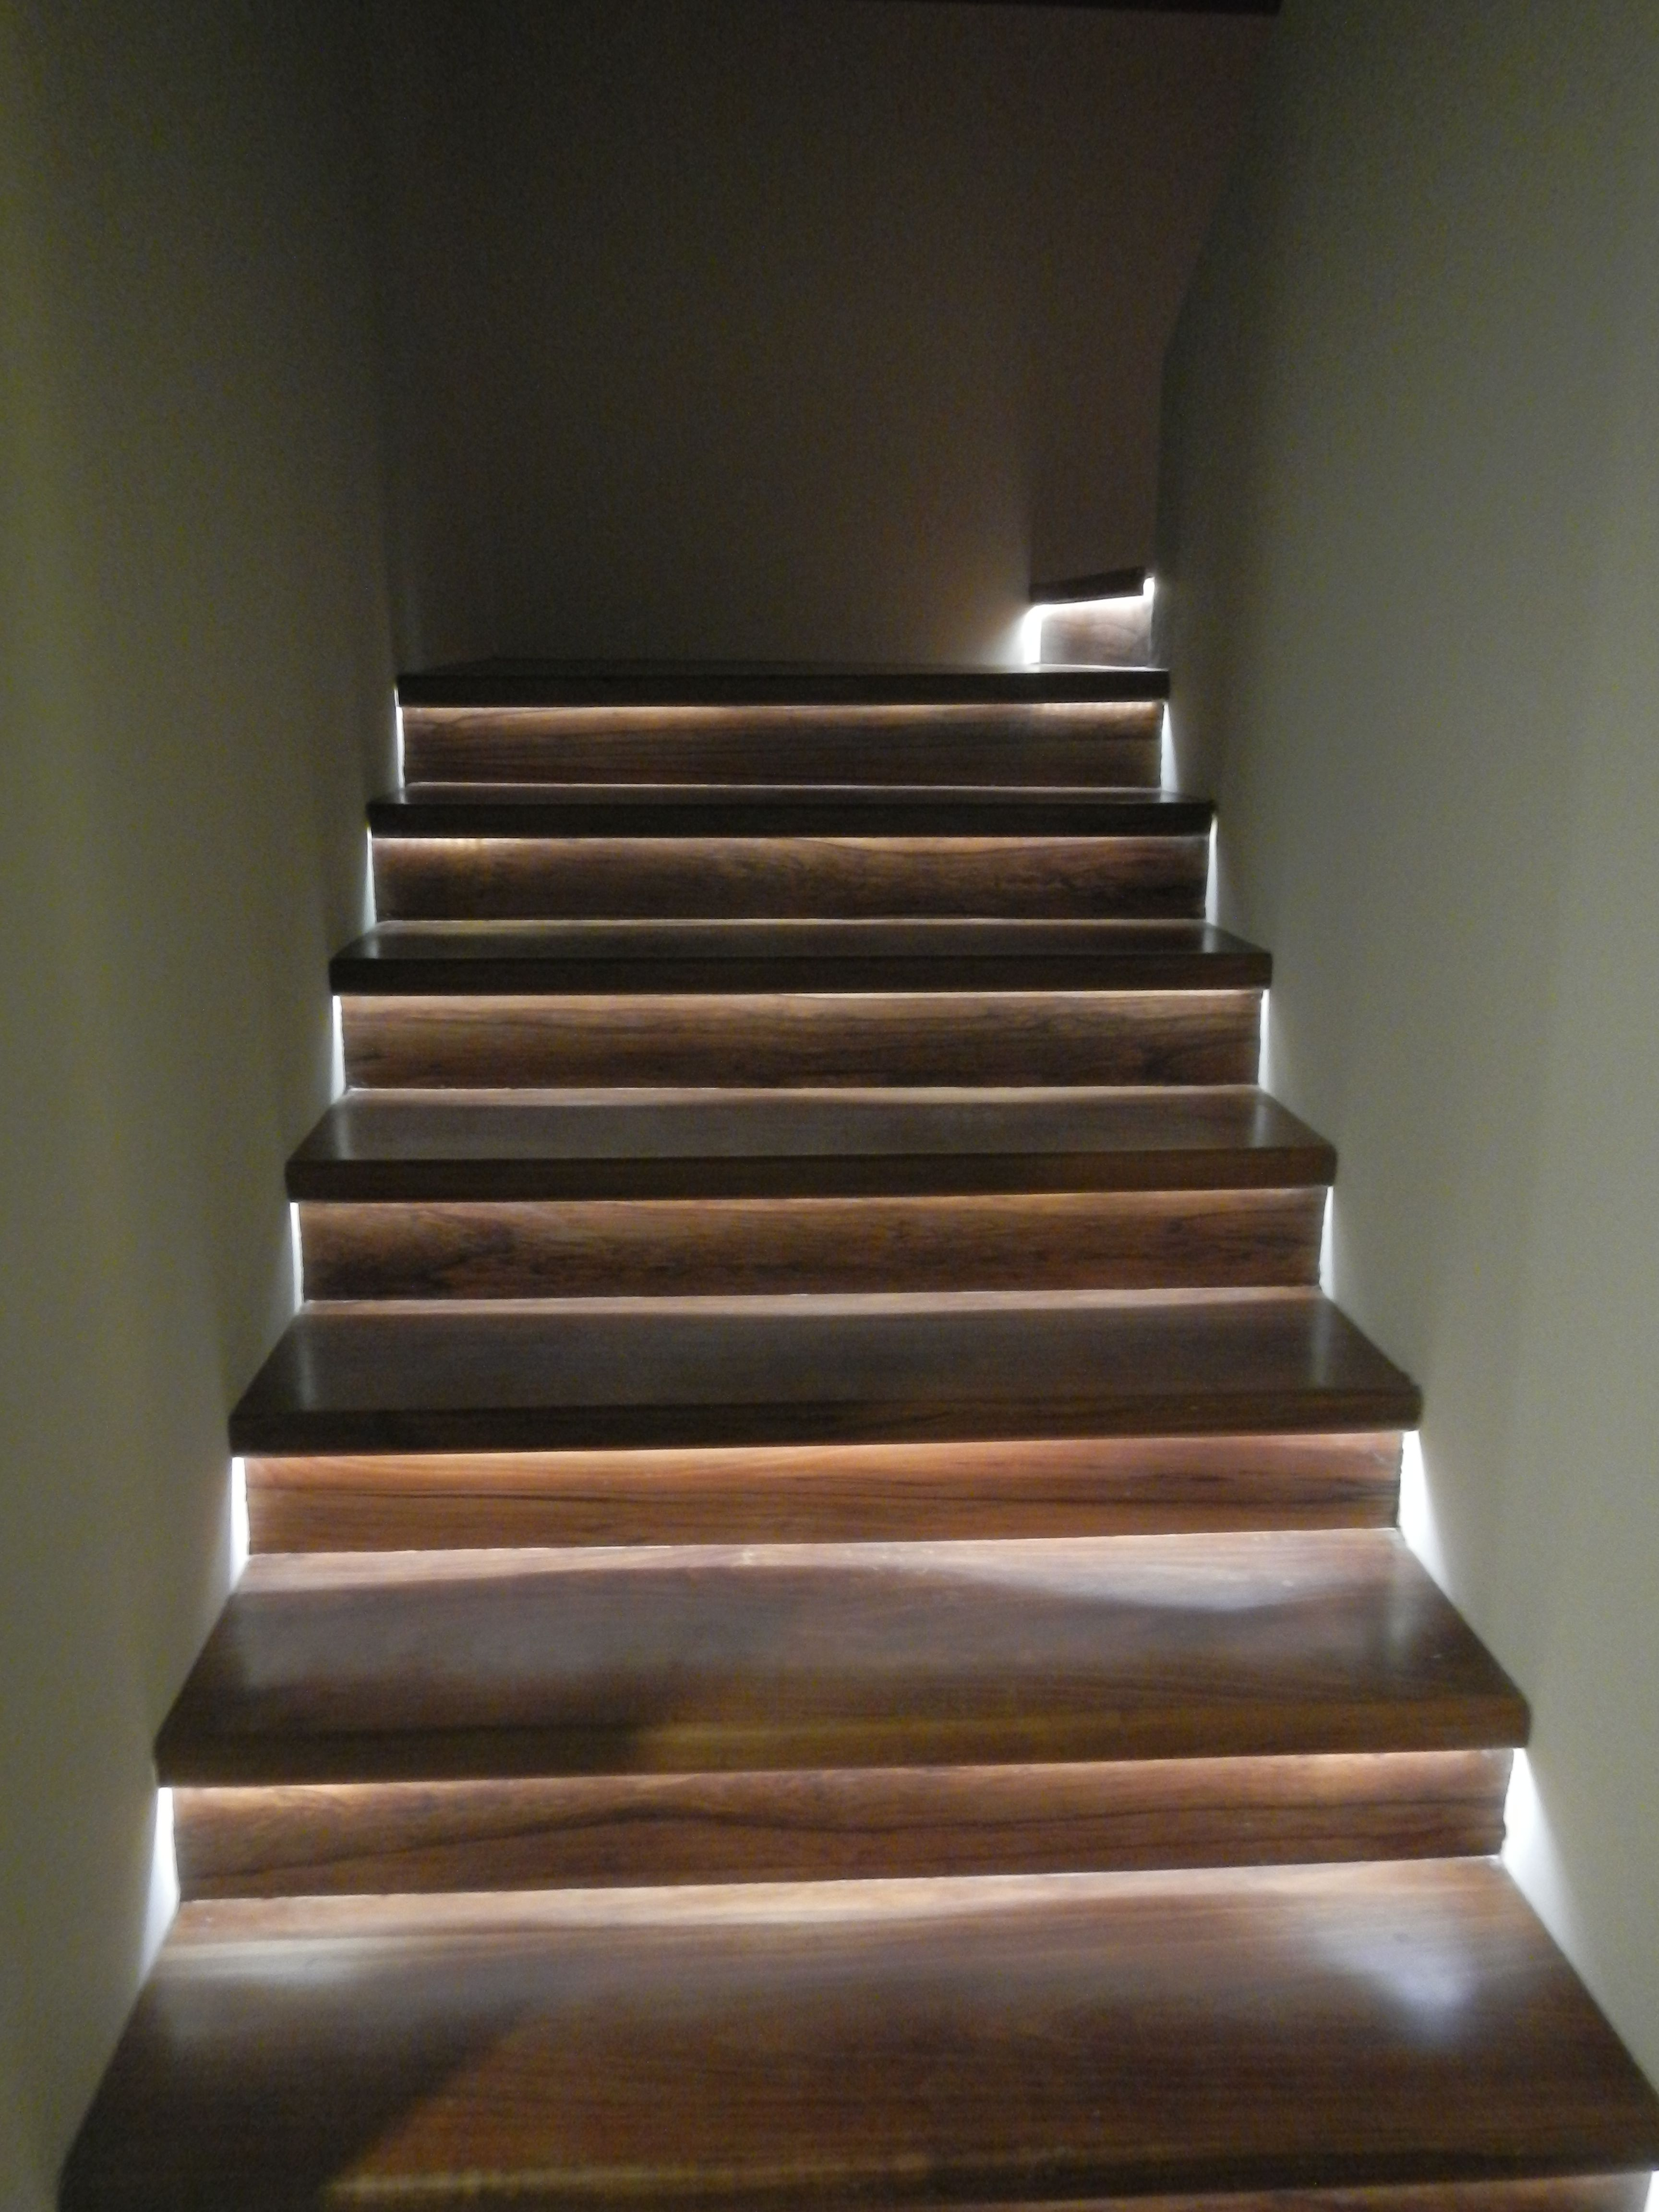 Iluminaci n indirecta en los escalones de la escalera con led interiorismo pinterest - Iluminacion indirecta led ...